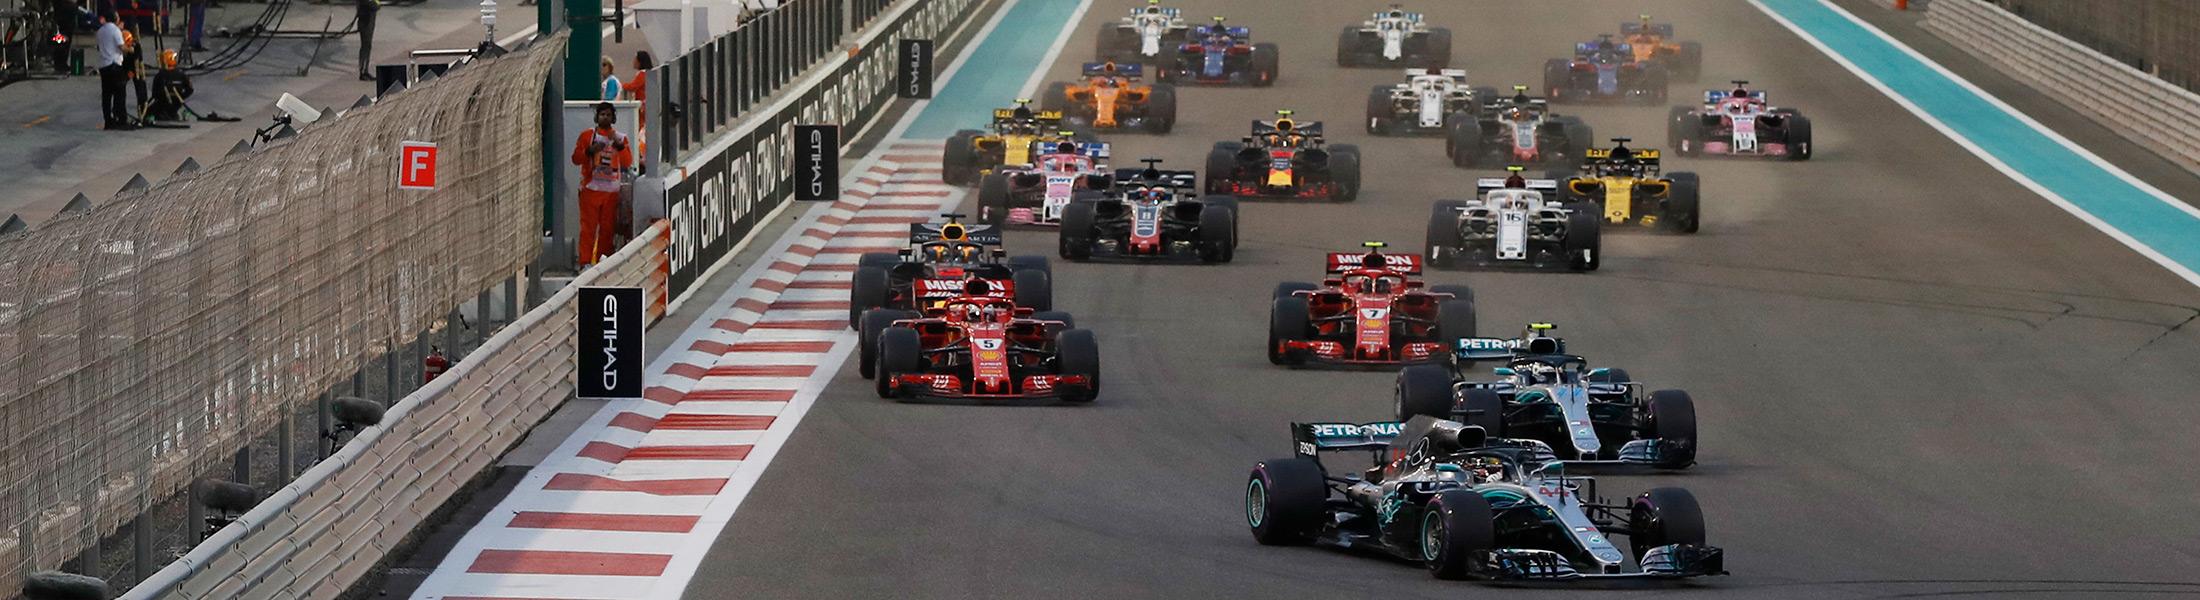 Formula 1 cars at the Abu Dhabi Grand Prix